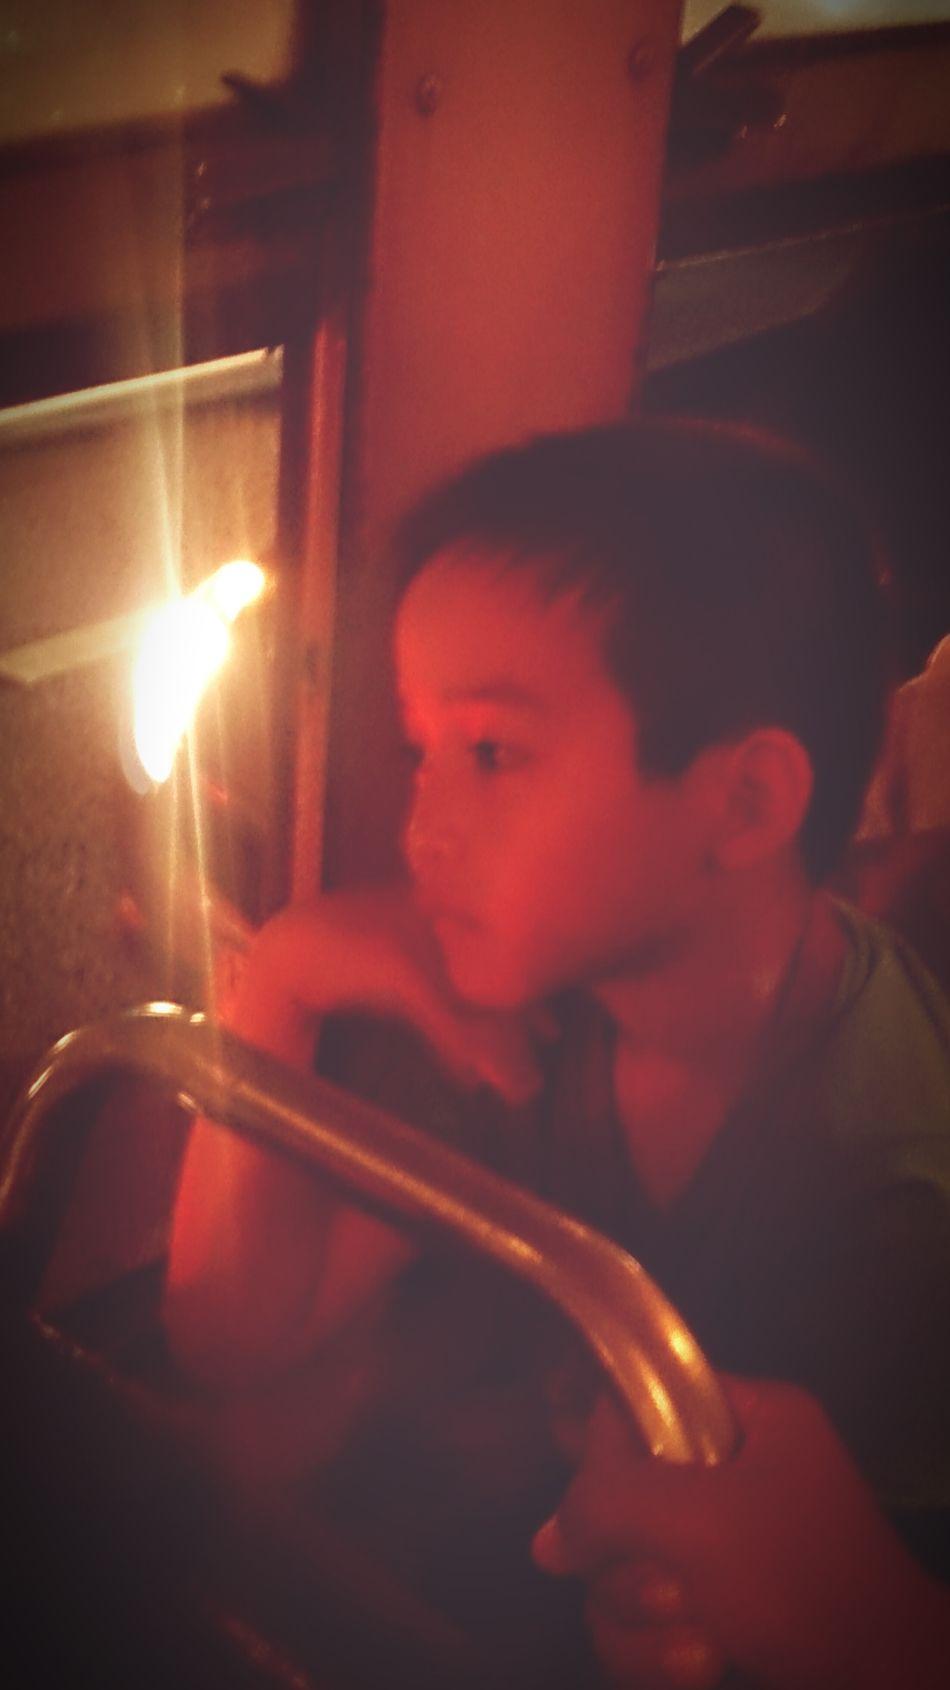 Kids Boy Thinking Missing Thebus Ontheroad Nightbus Bangkok Boring Trafficjam